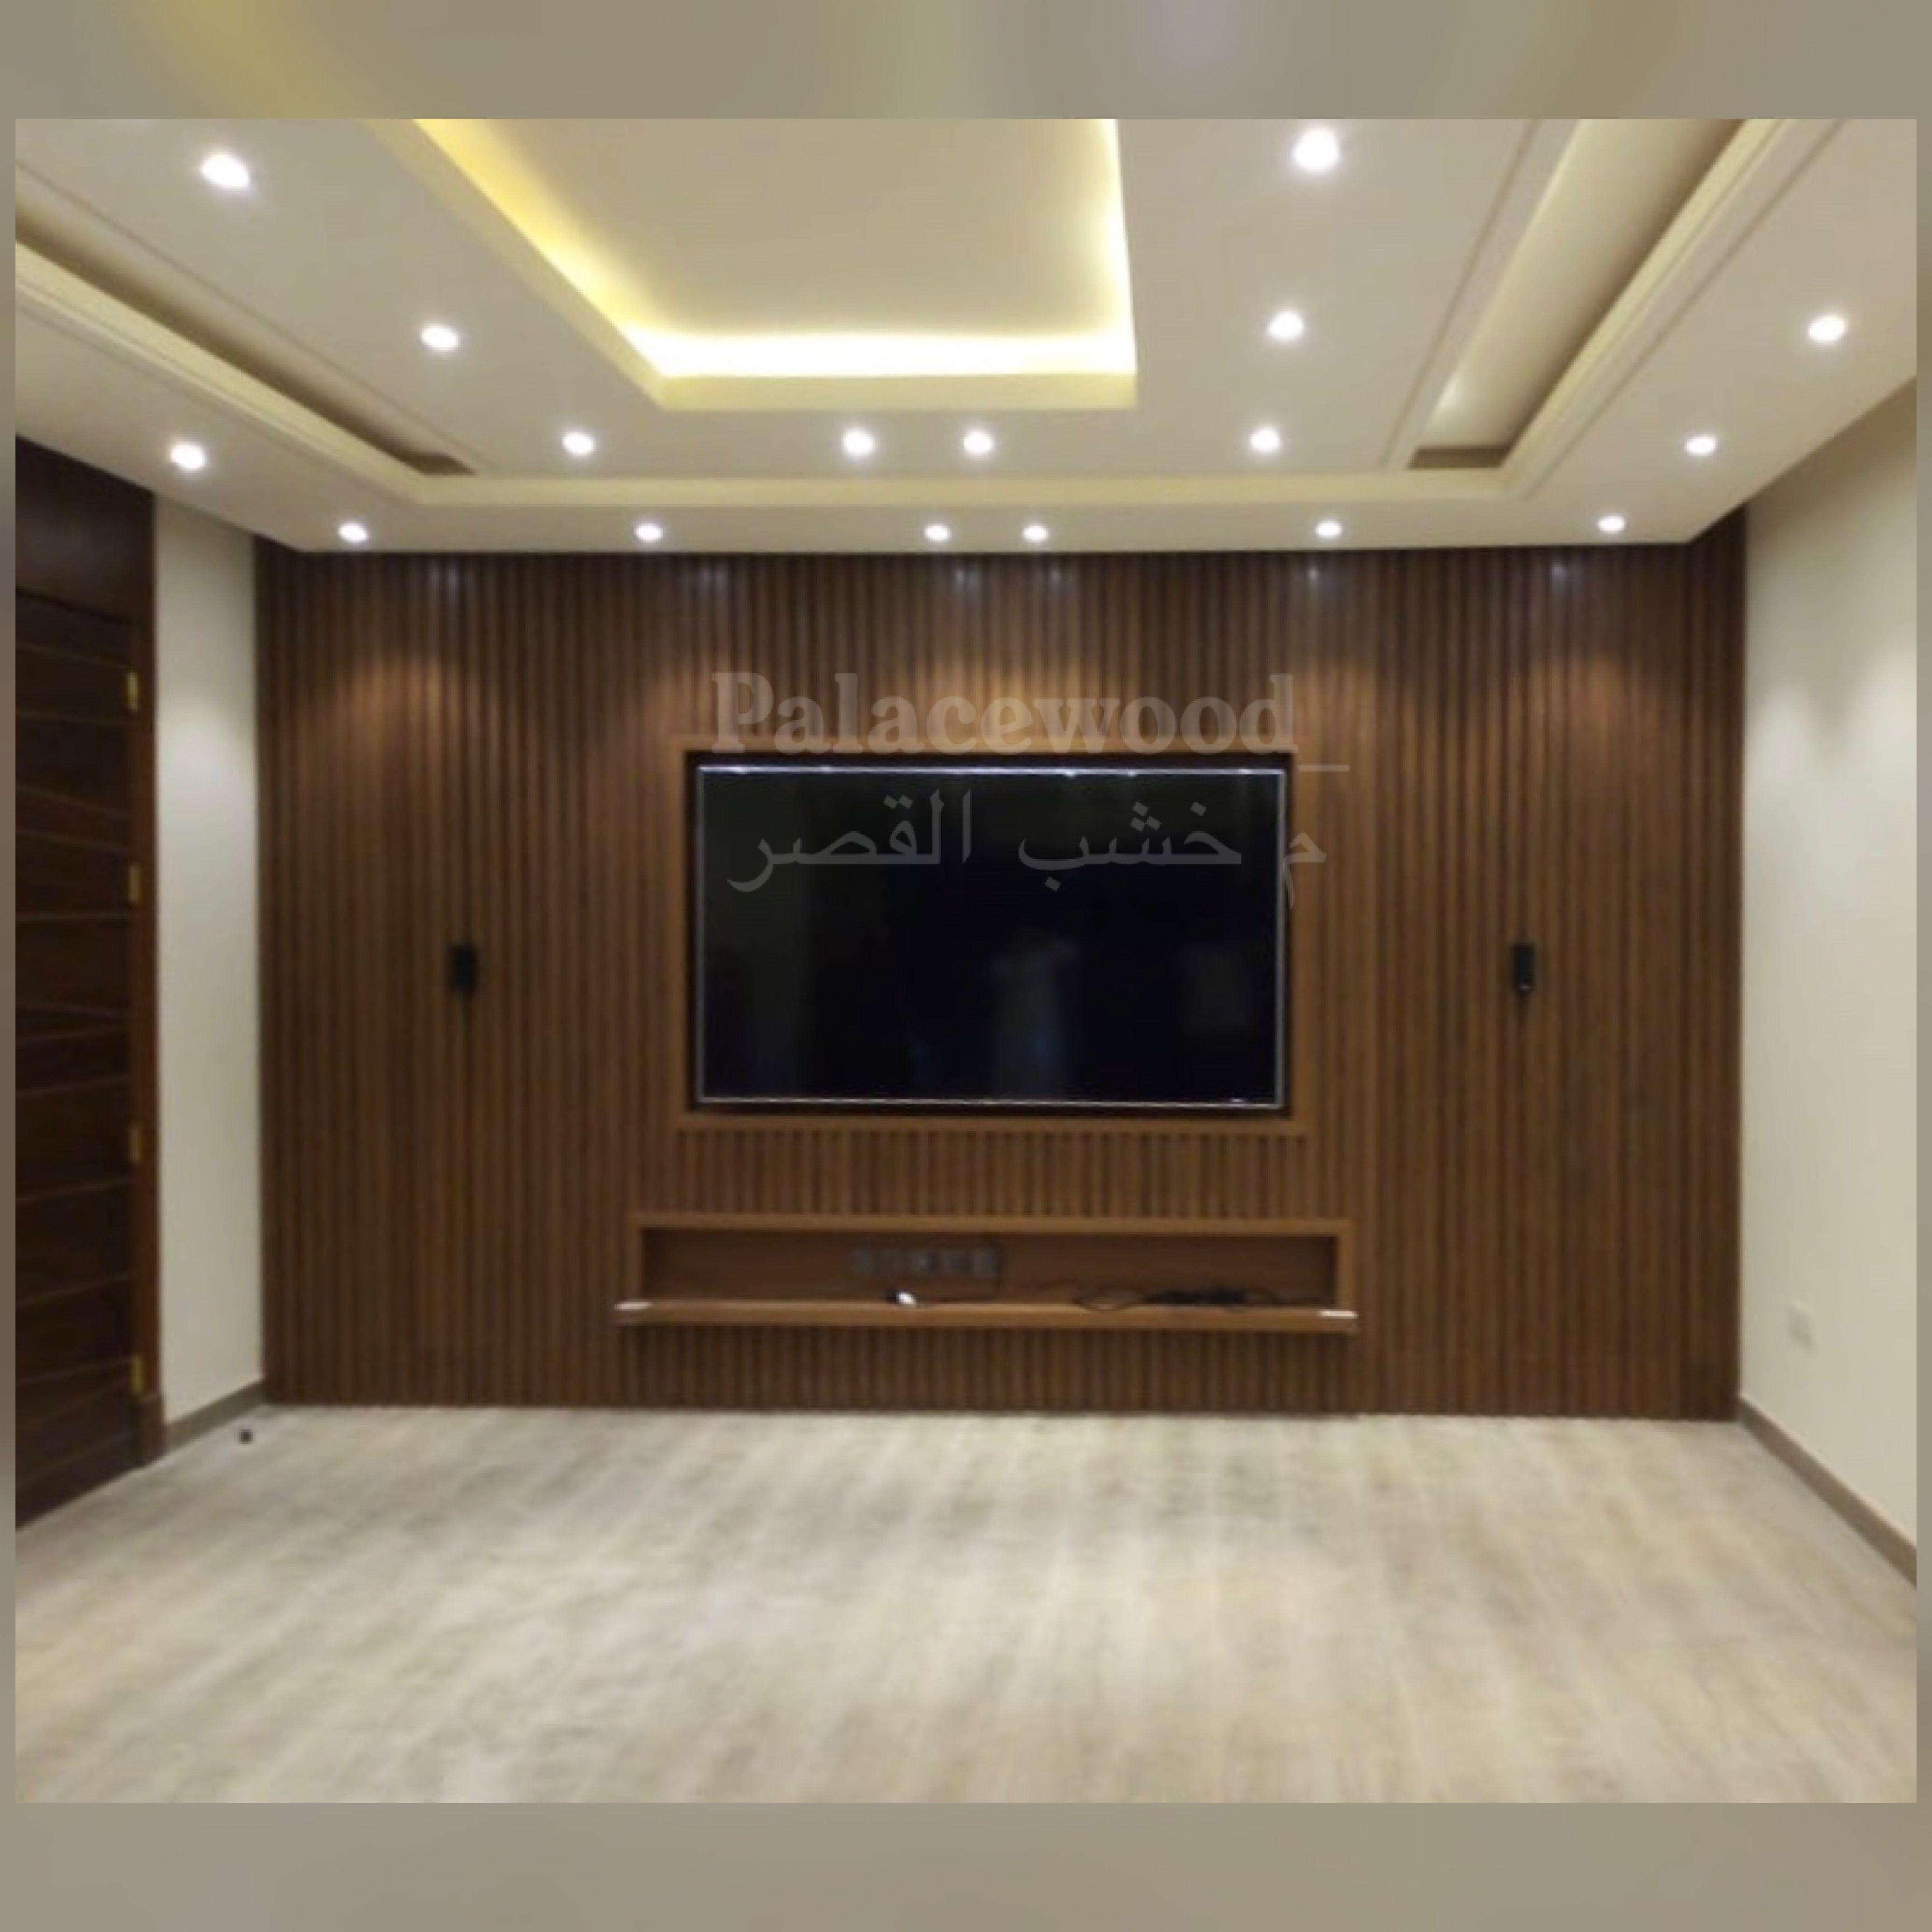 ديكورات خشبية داخلية Home Decor Home Decor